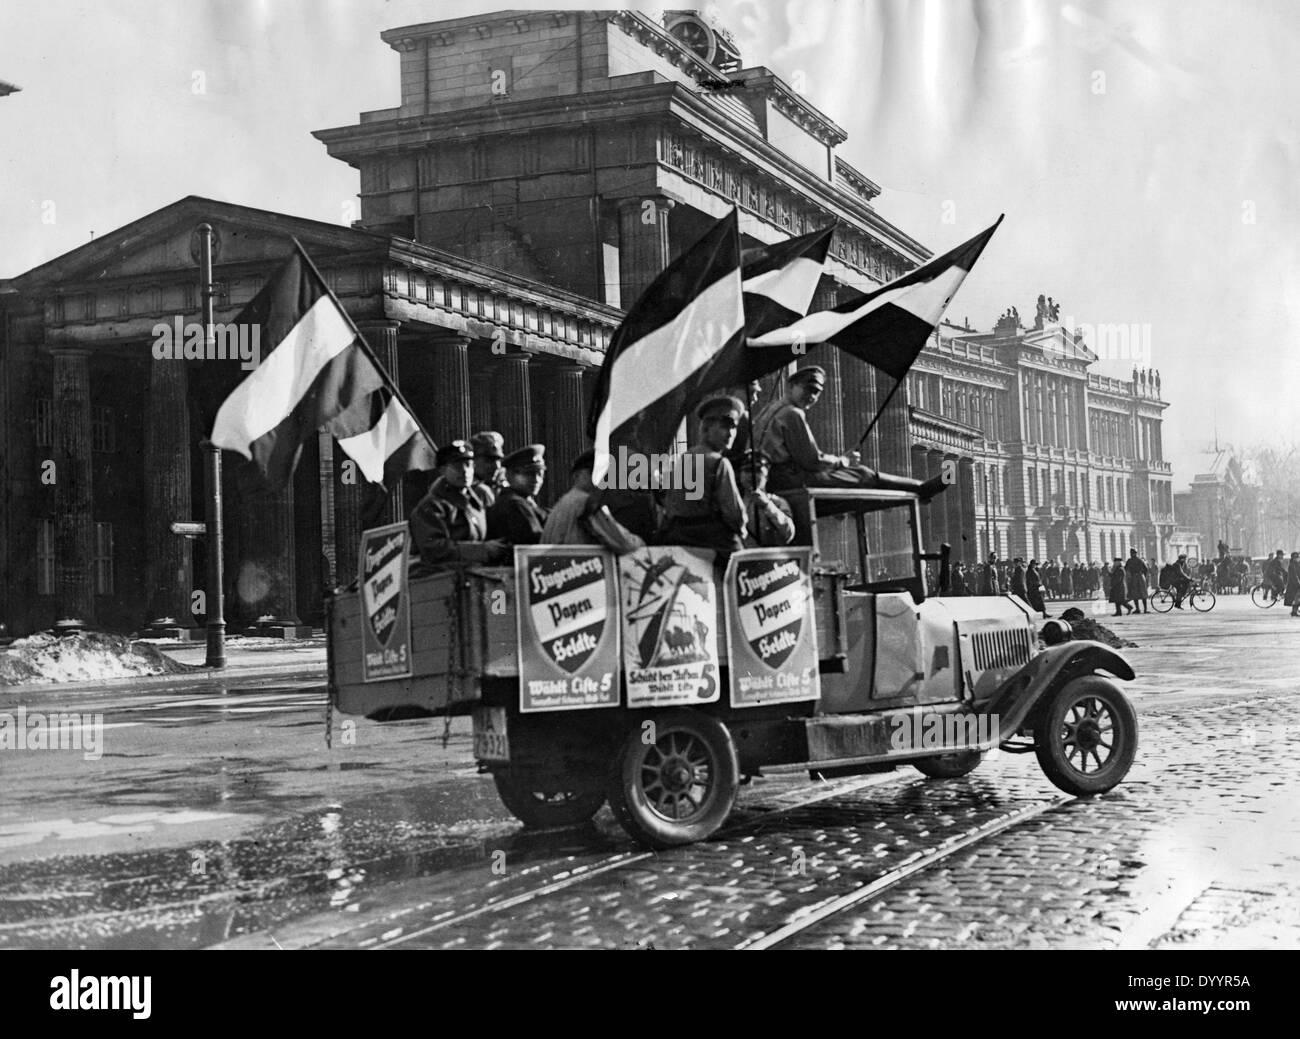 German Nationalist propaganda vehicle, 1933 - Stock Image